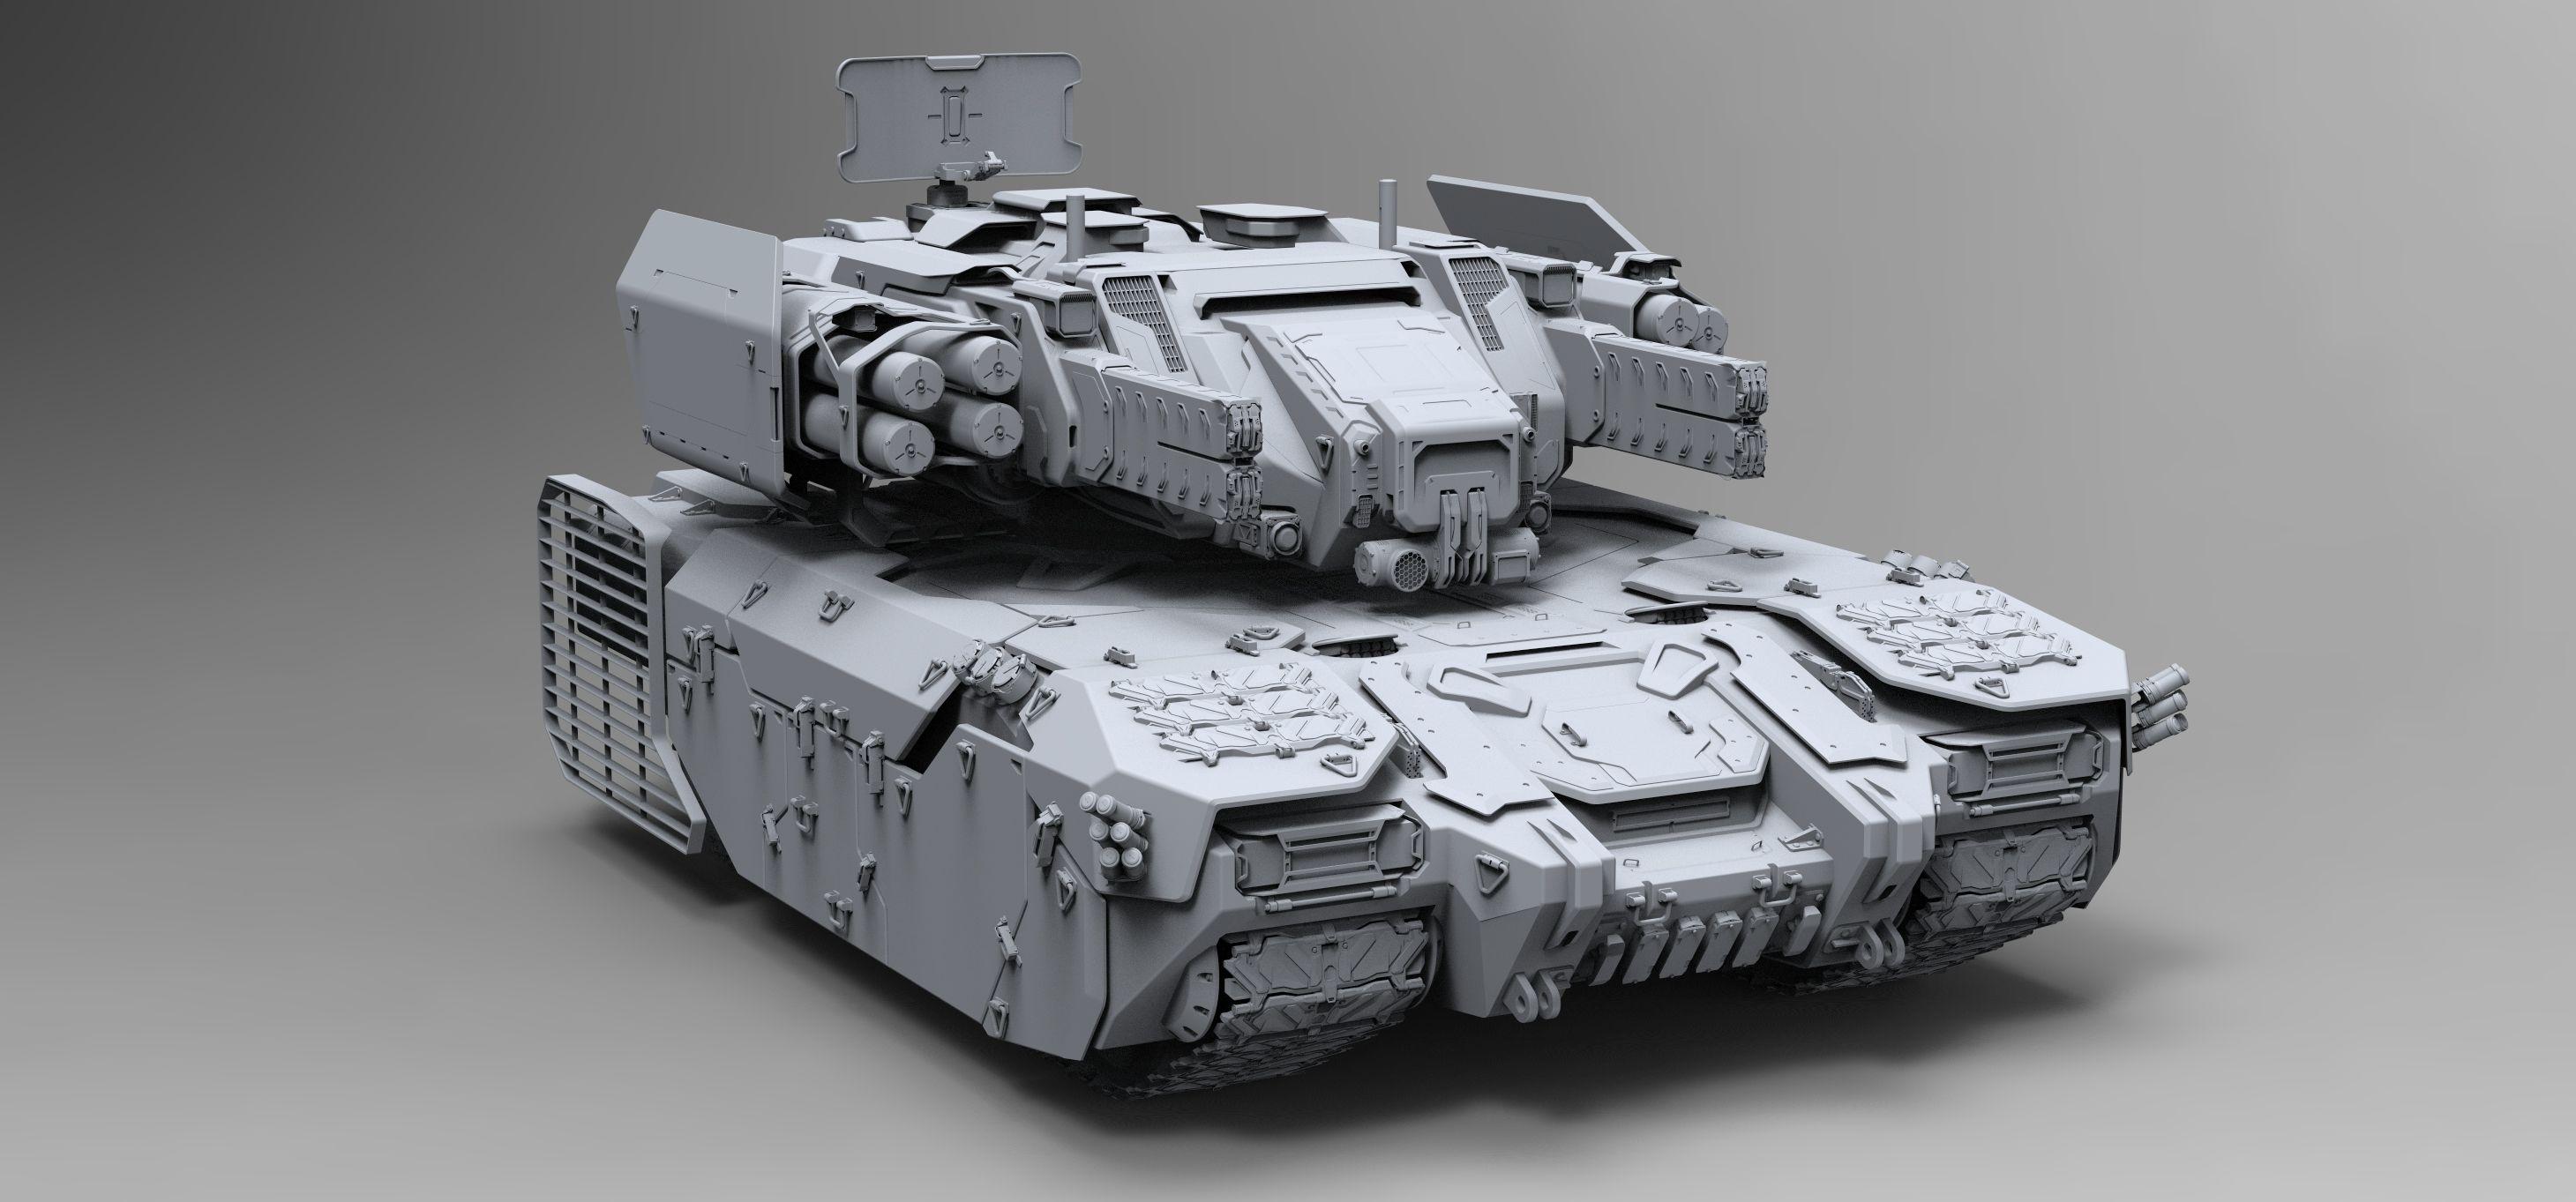 Zprk-tron--3500-3500